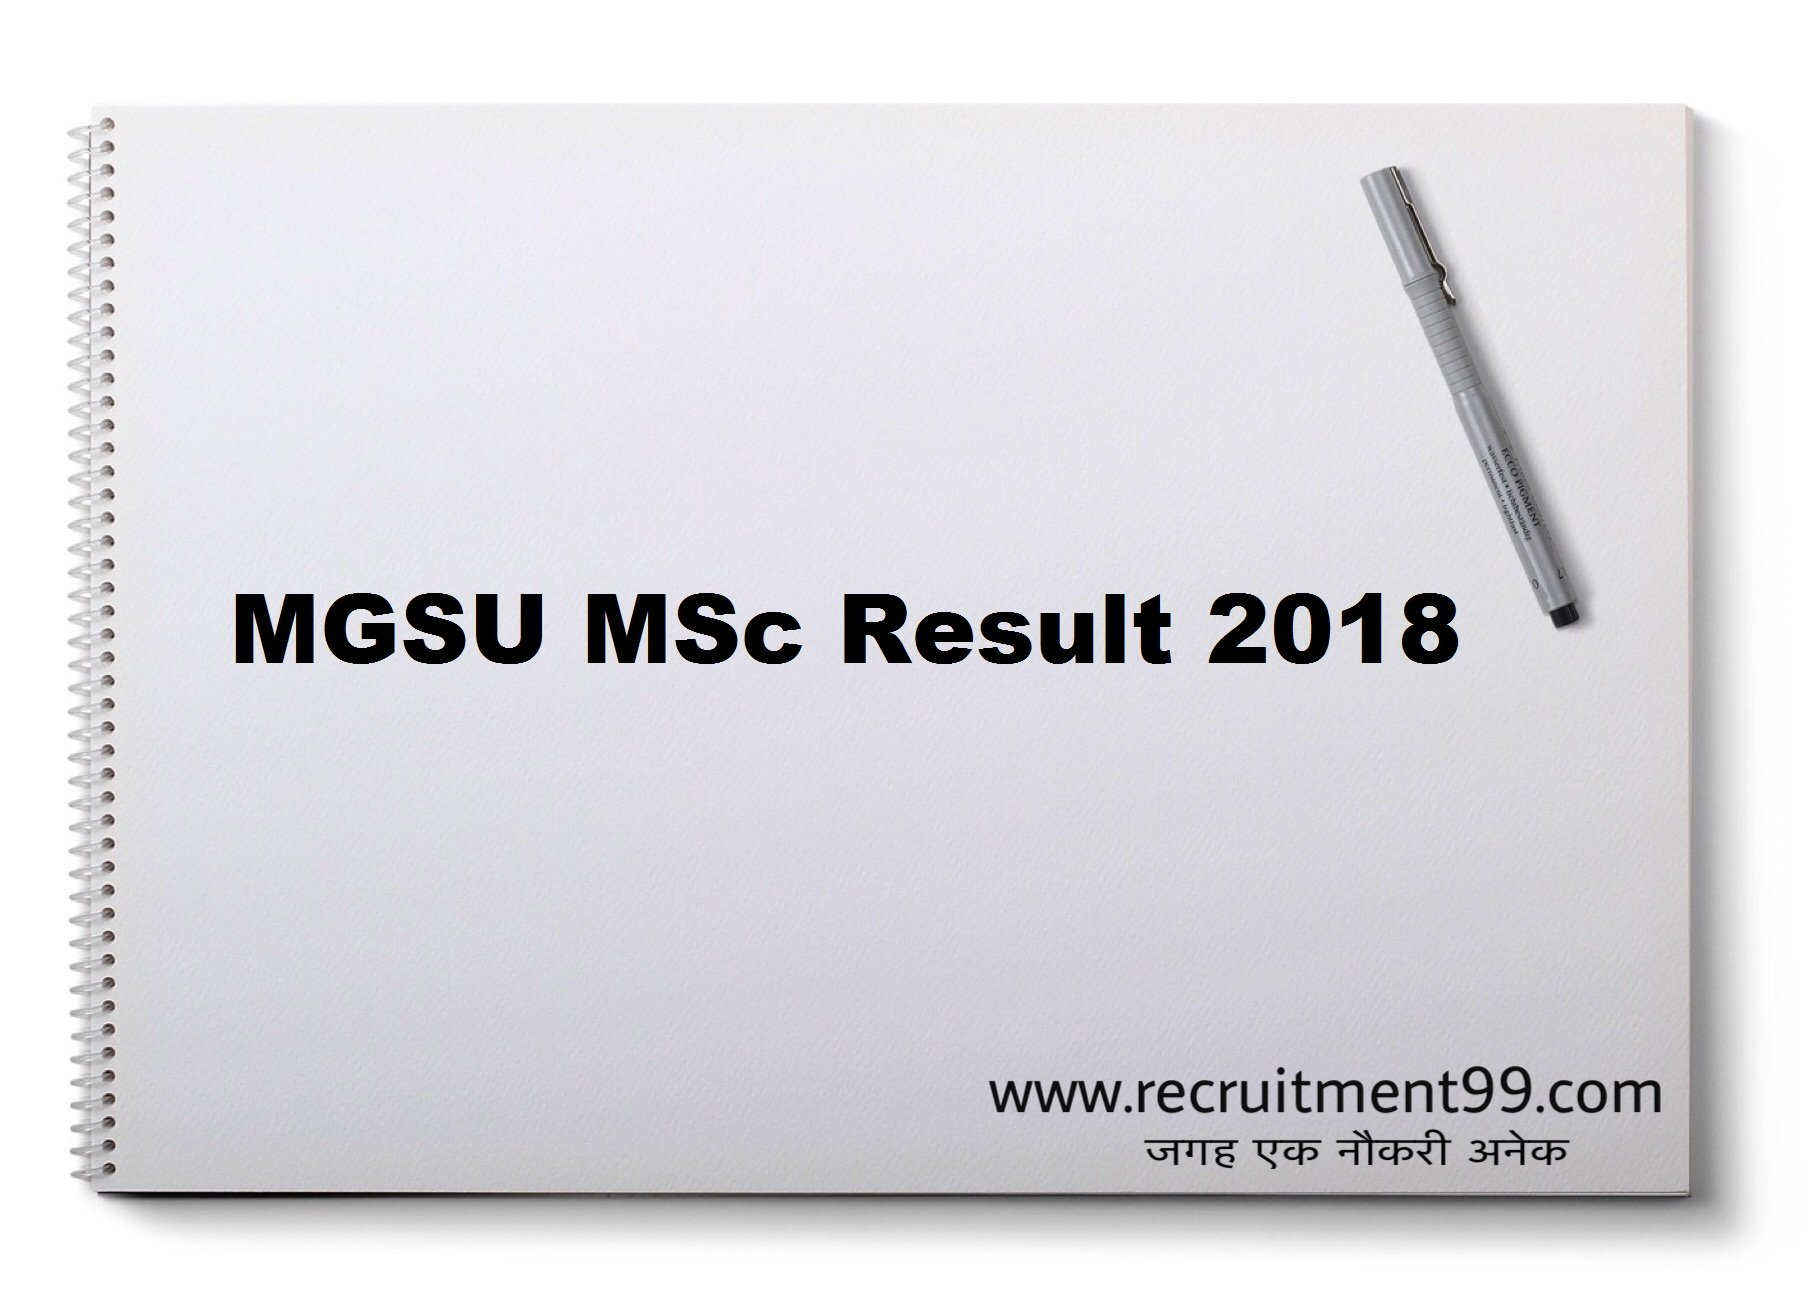 MGSU Bikaner MSc Result 2018